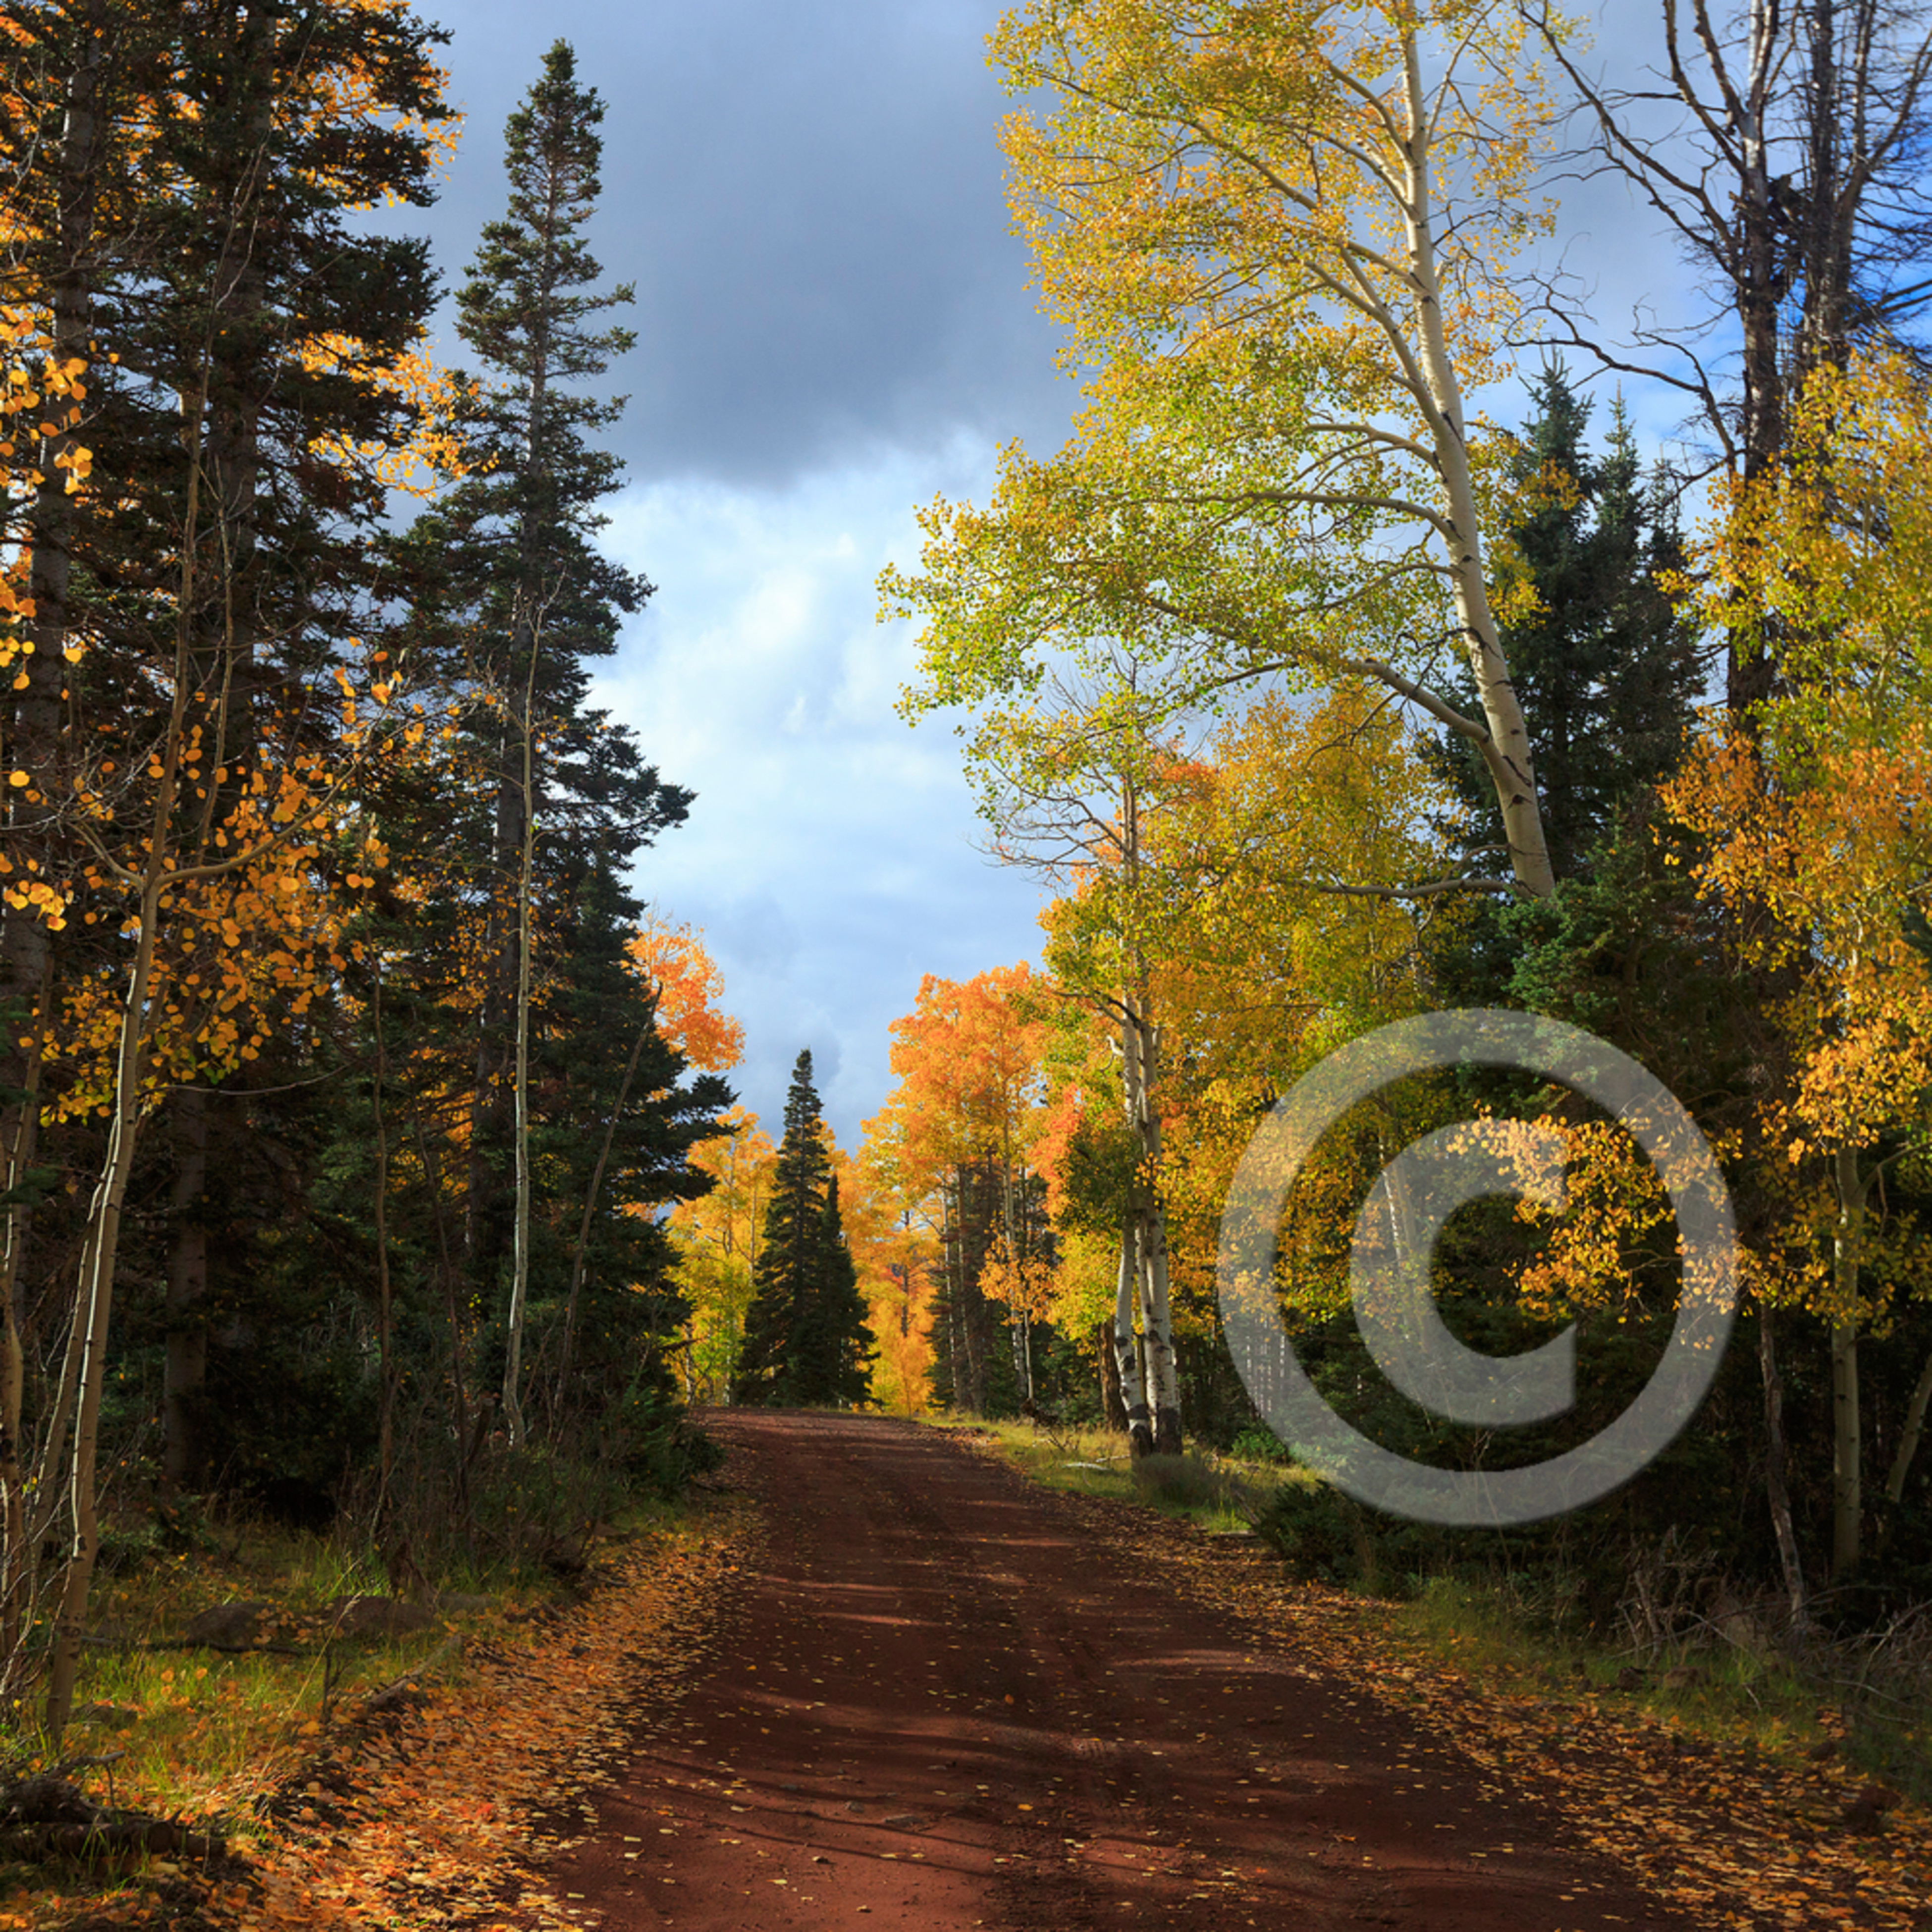 Mj20140929 3357 autumn pathway zlw7xq